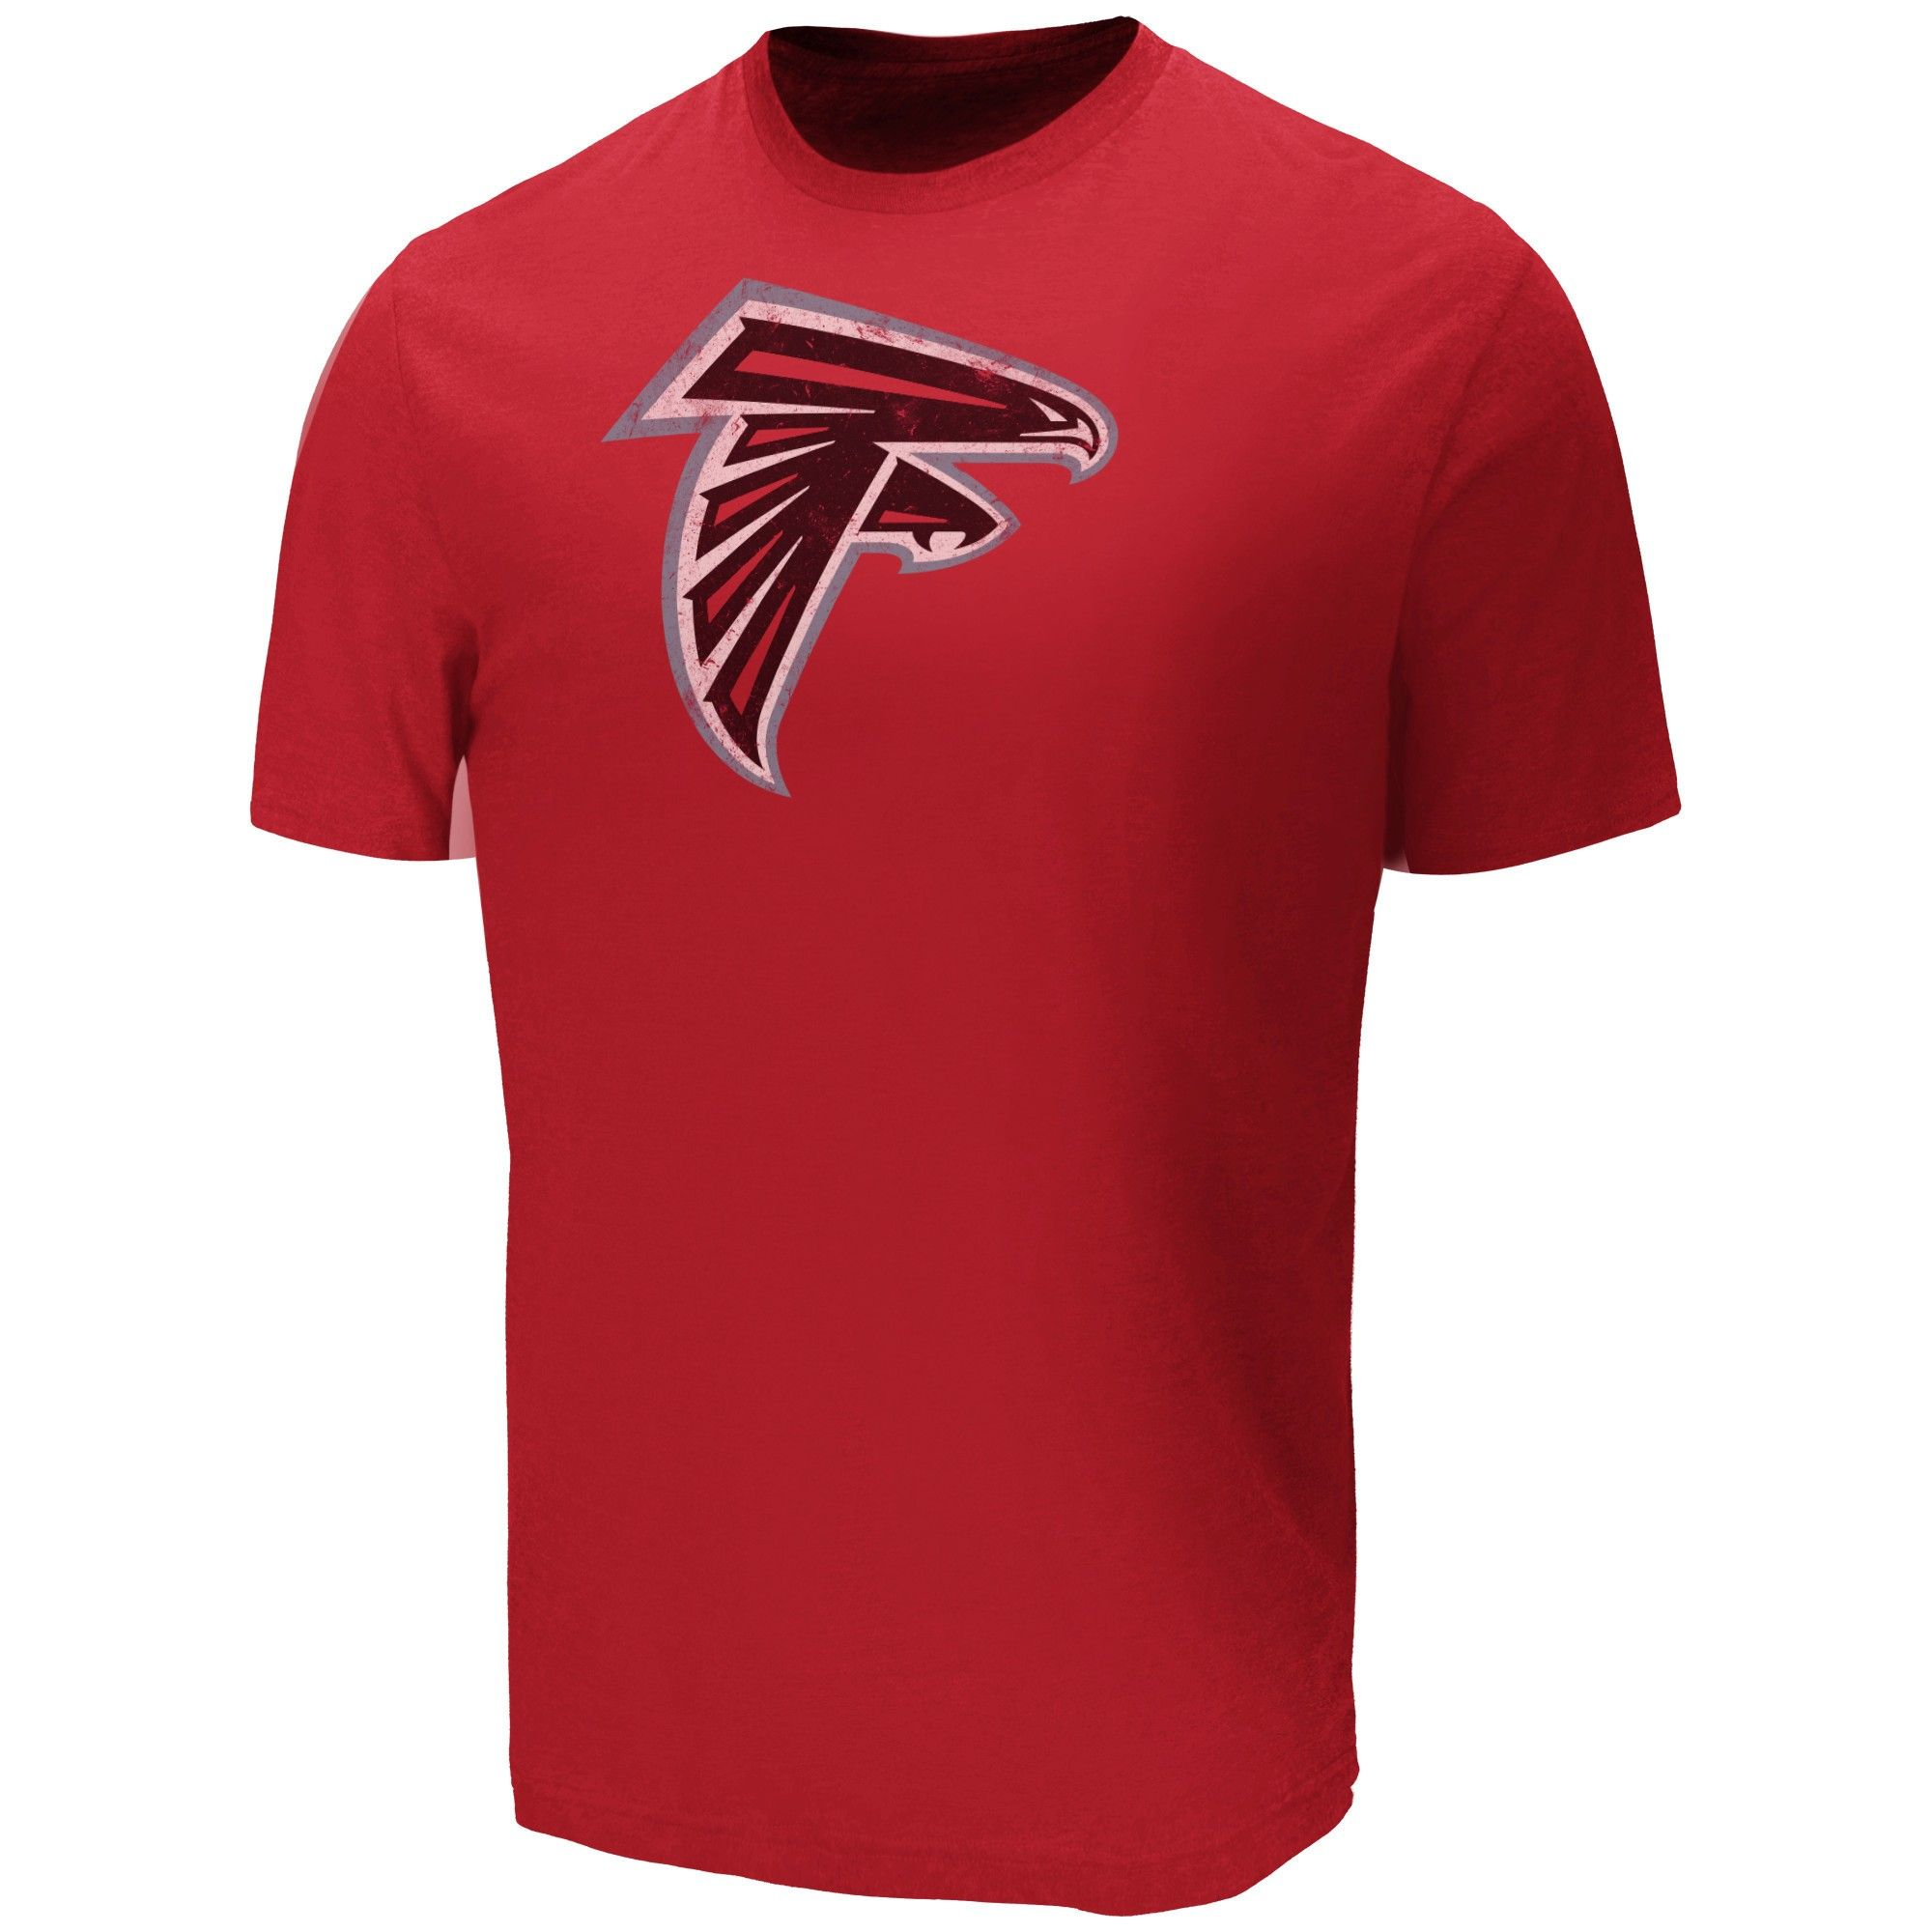 9db4407874 Atlanta Falcons Men's Target Sueded Cotton T-Shirt XXL, MultiColored ...